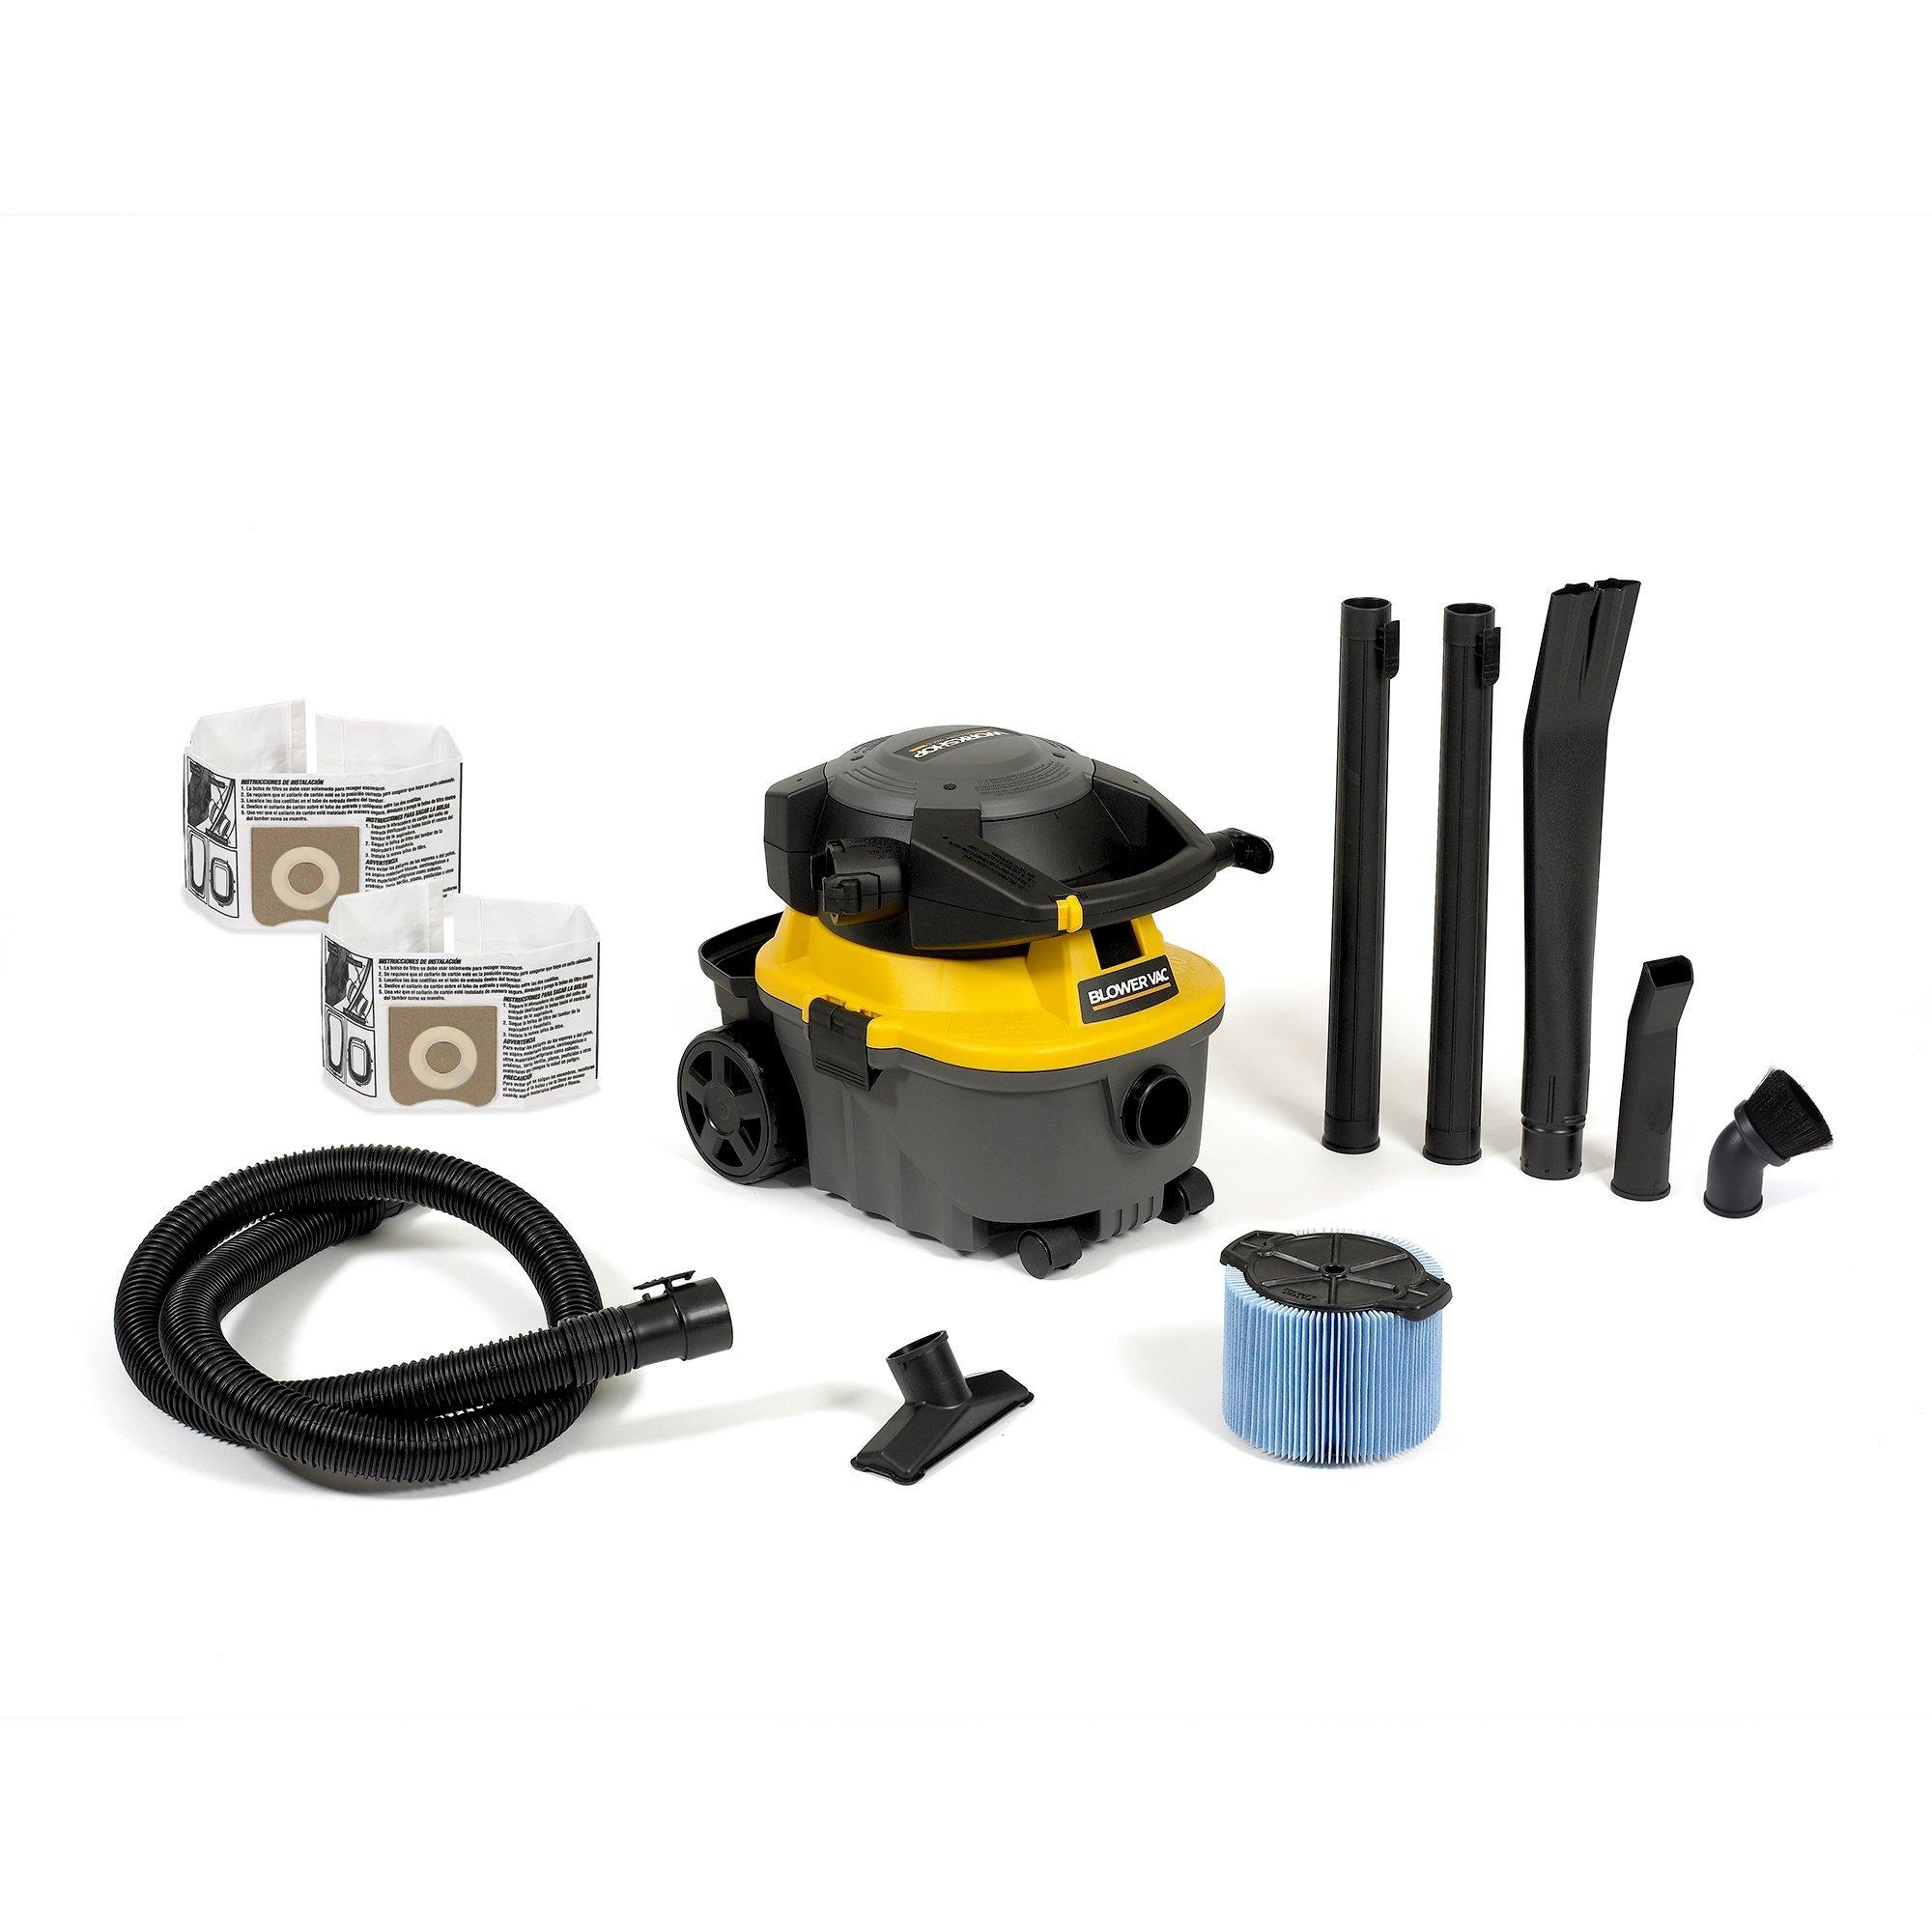 WORKSHOP Wet Dry Blower Vac WS0400DE, 4-Gallon Leaf Blower Vacuum Cleaner, 6.0 Peak HP w/bags and attachment